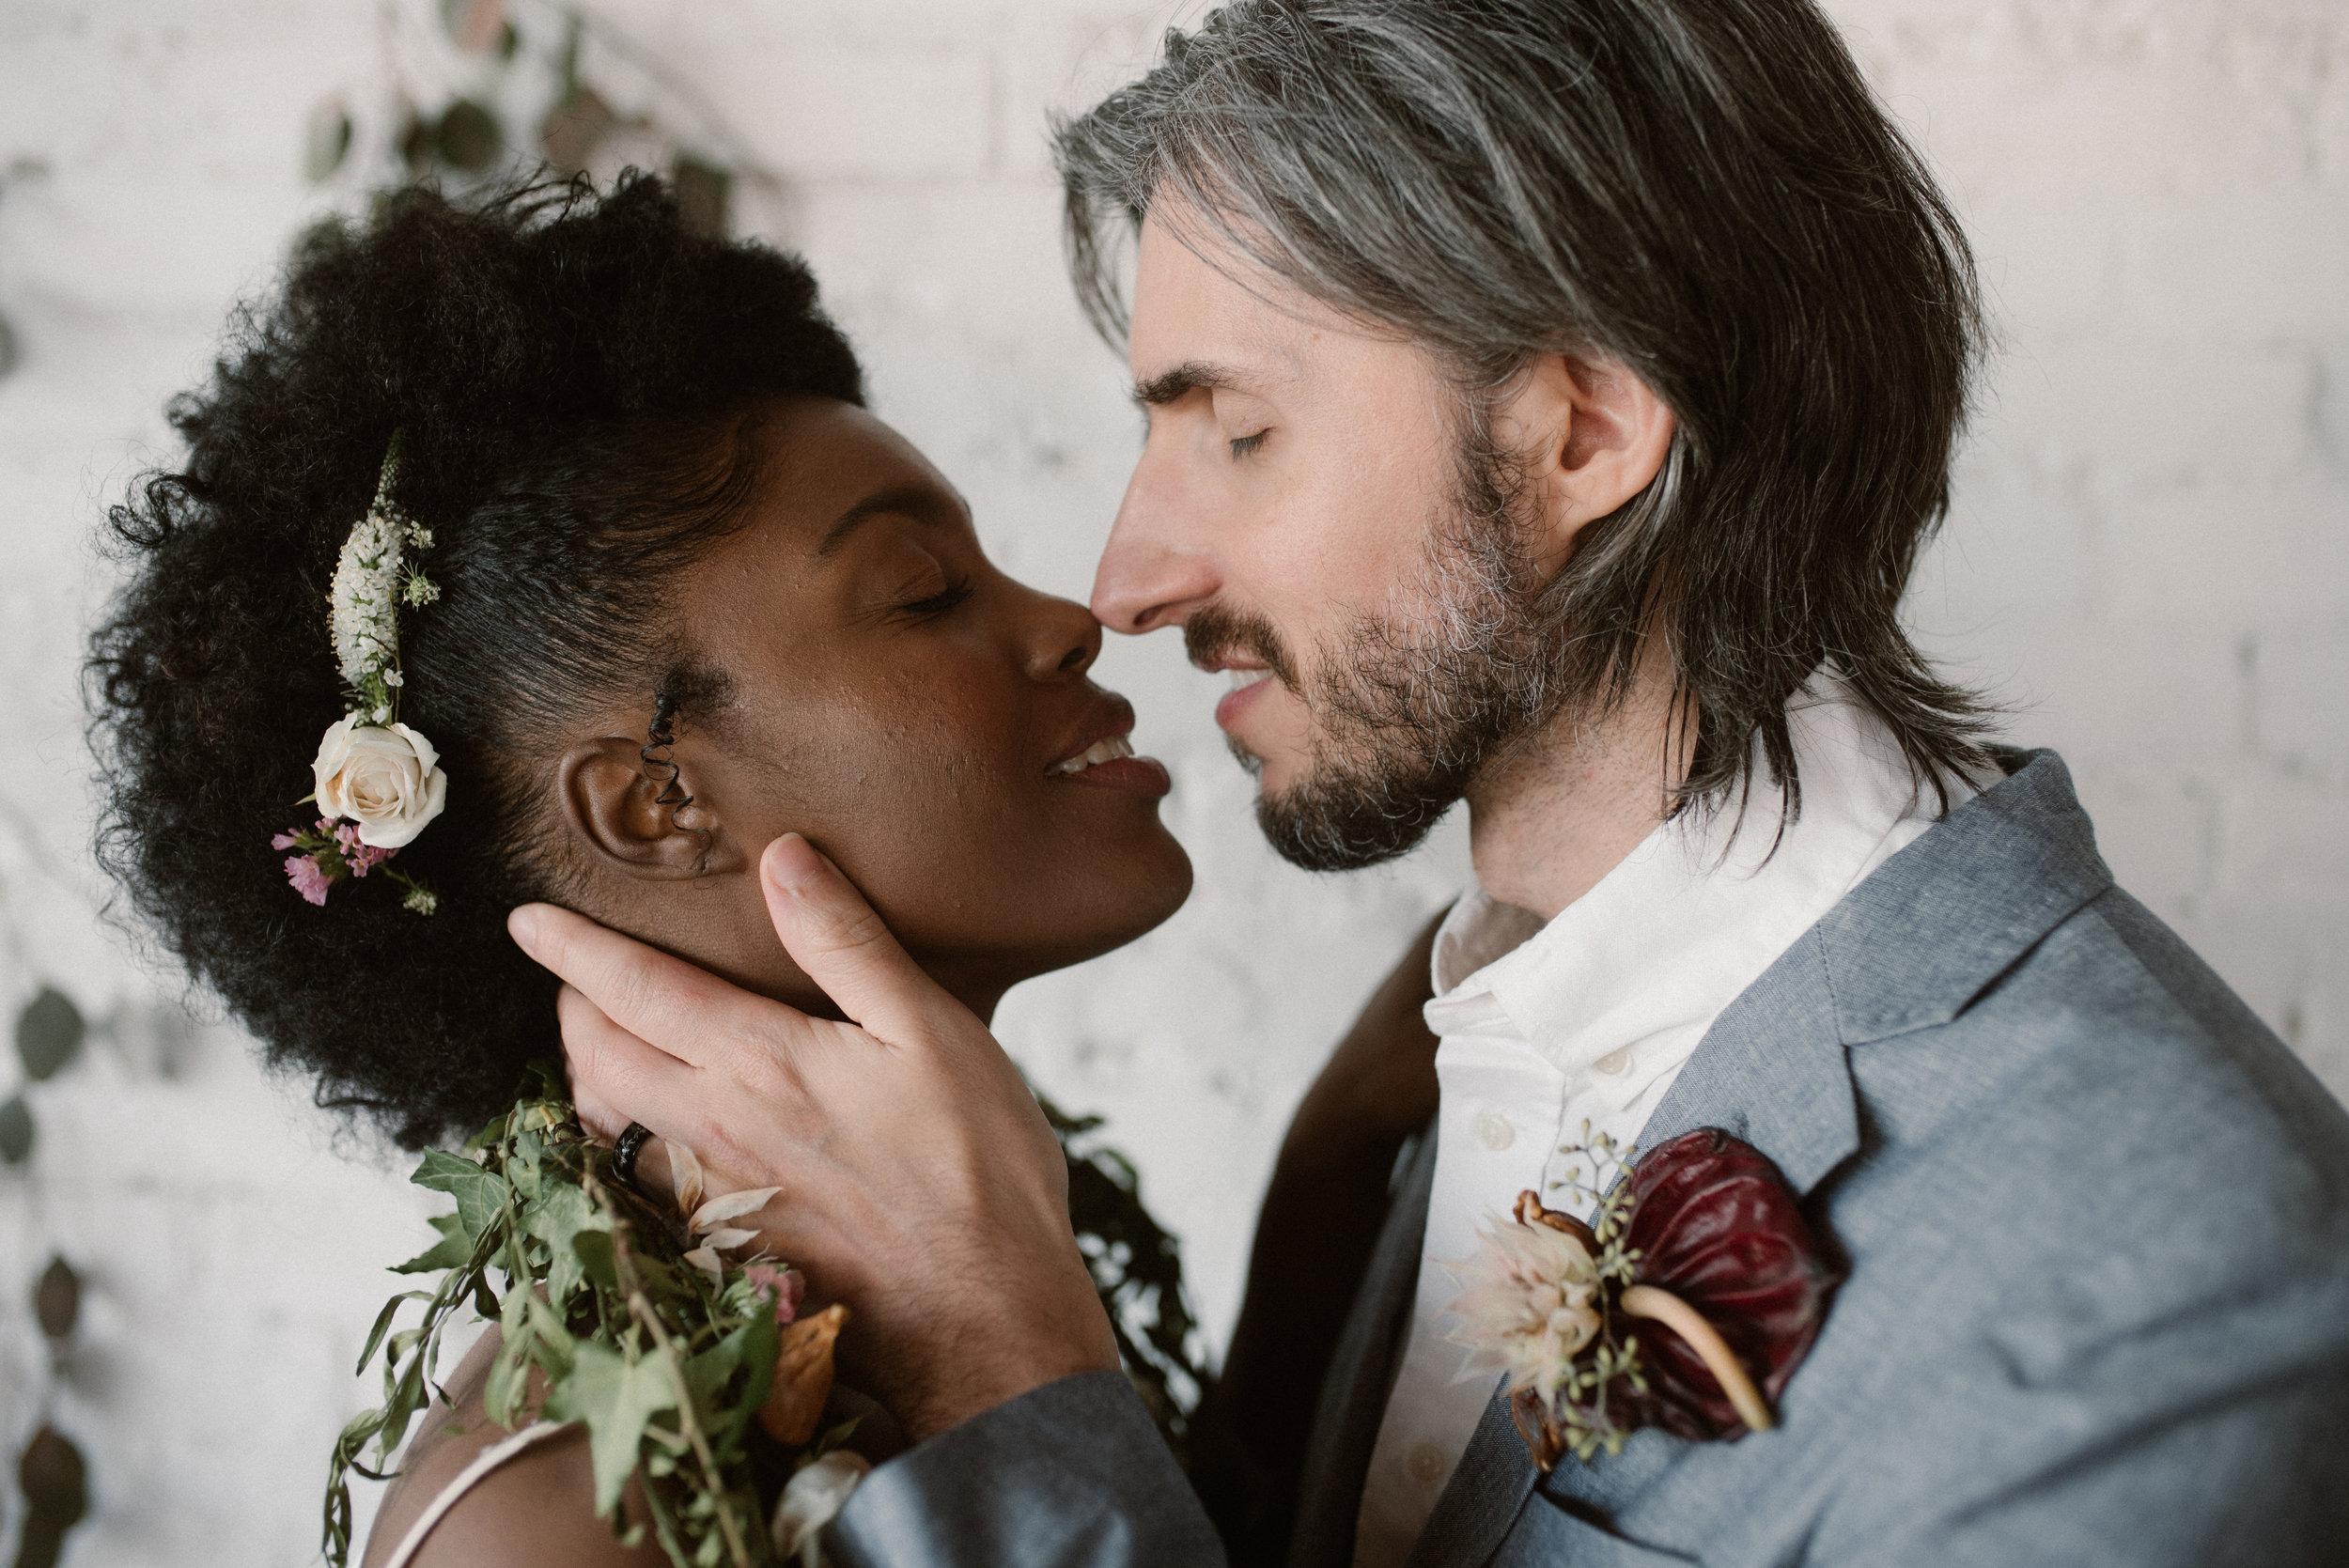 haus-820-minimal-editorial-wedding-styled-shoot-64.jpg